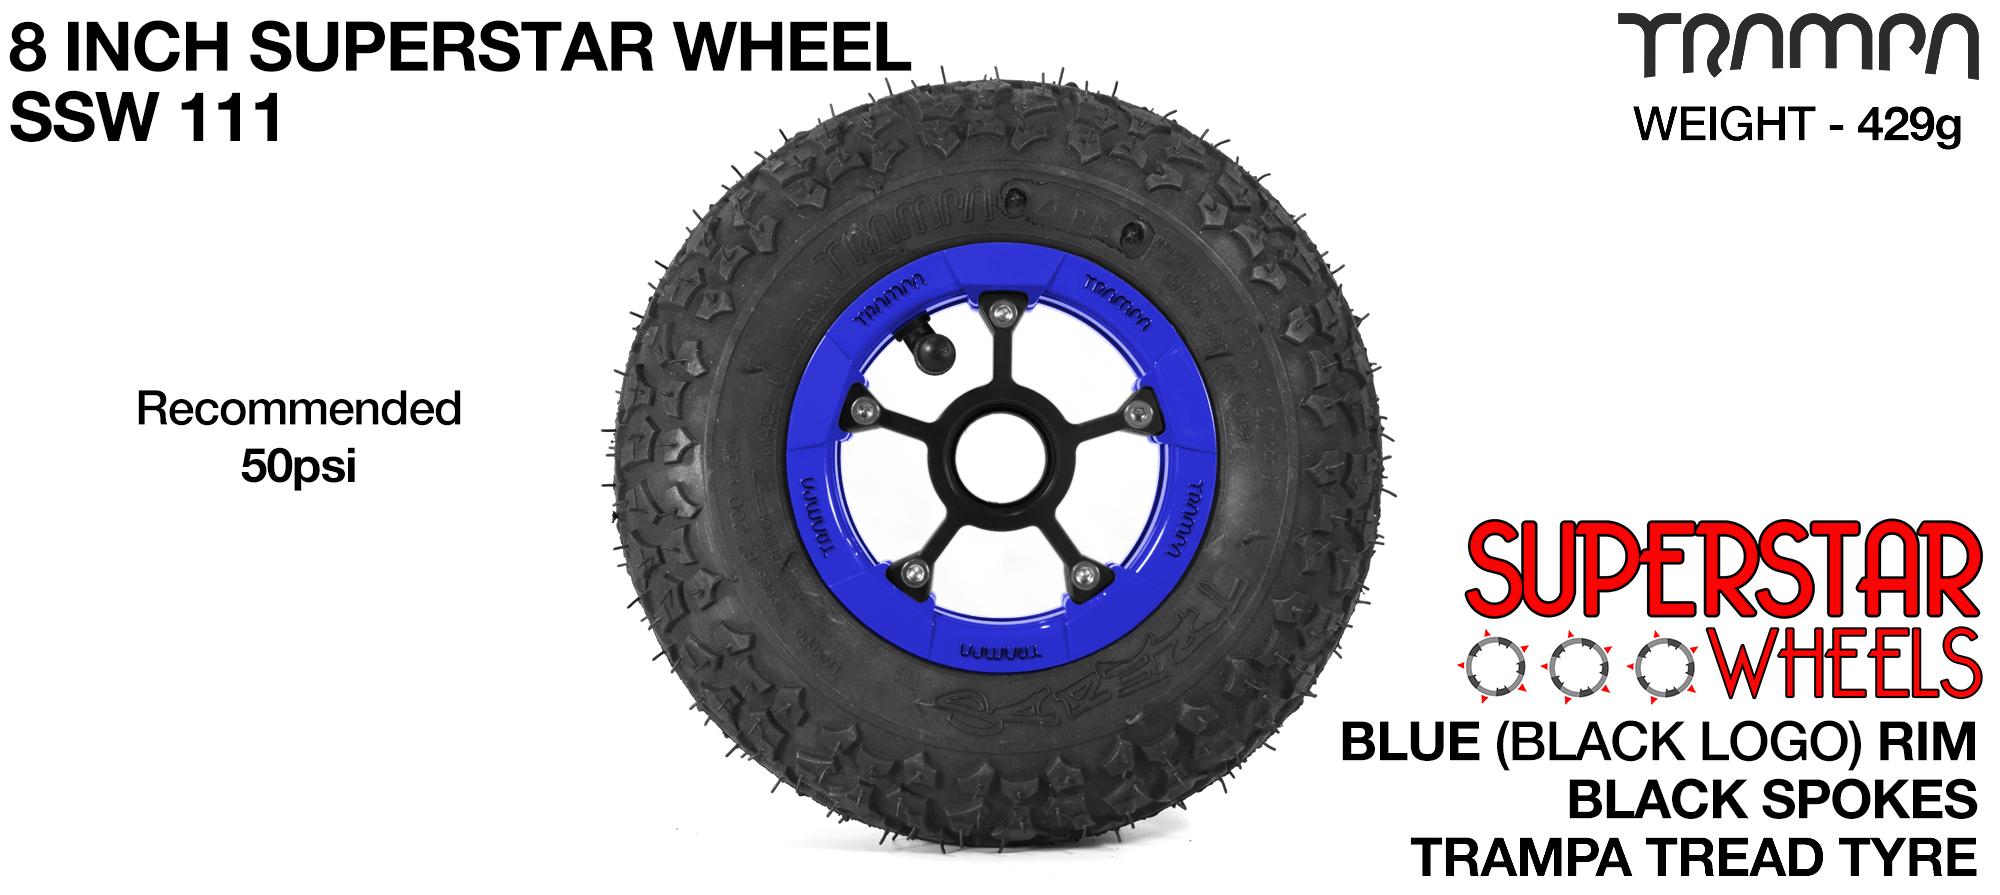 Superstar 8 inch wheels -  Blue & Black Logo Rim Black Anodised spokes & TRAMPA TREAD 8 inch Tyre